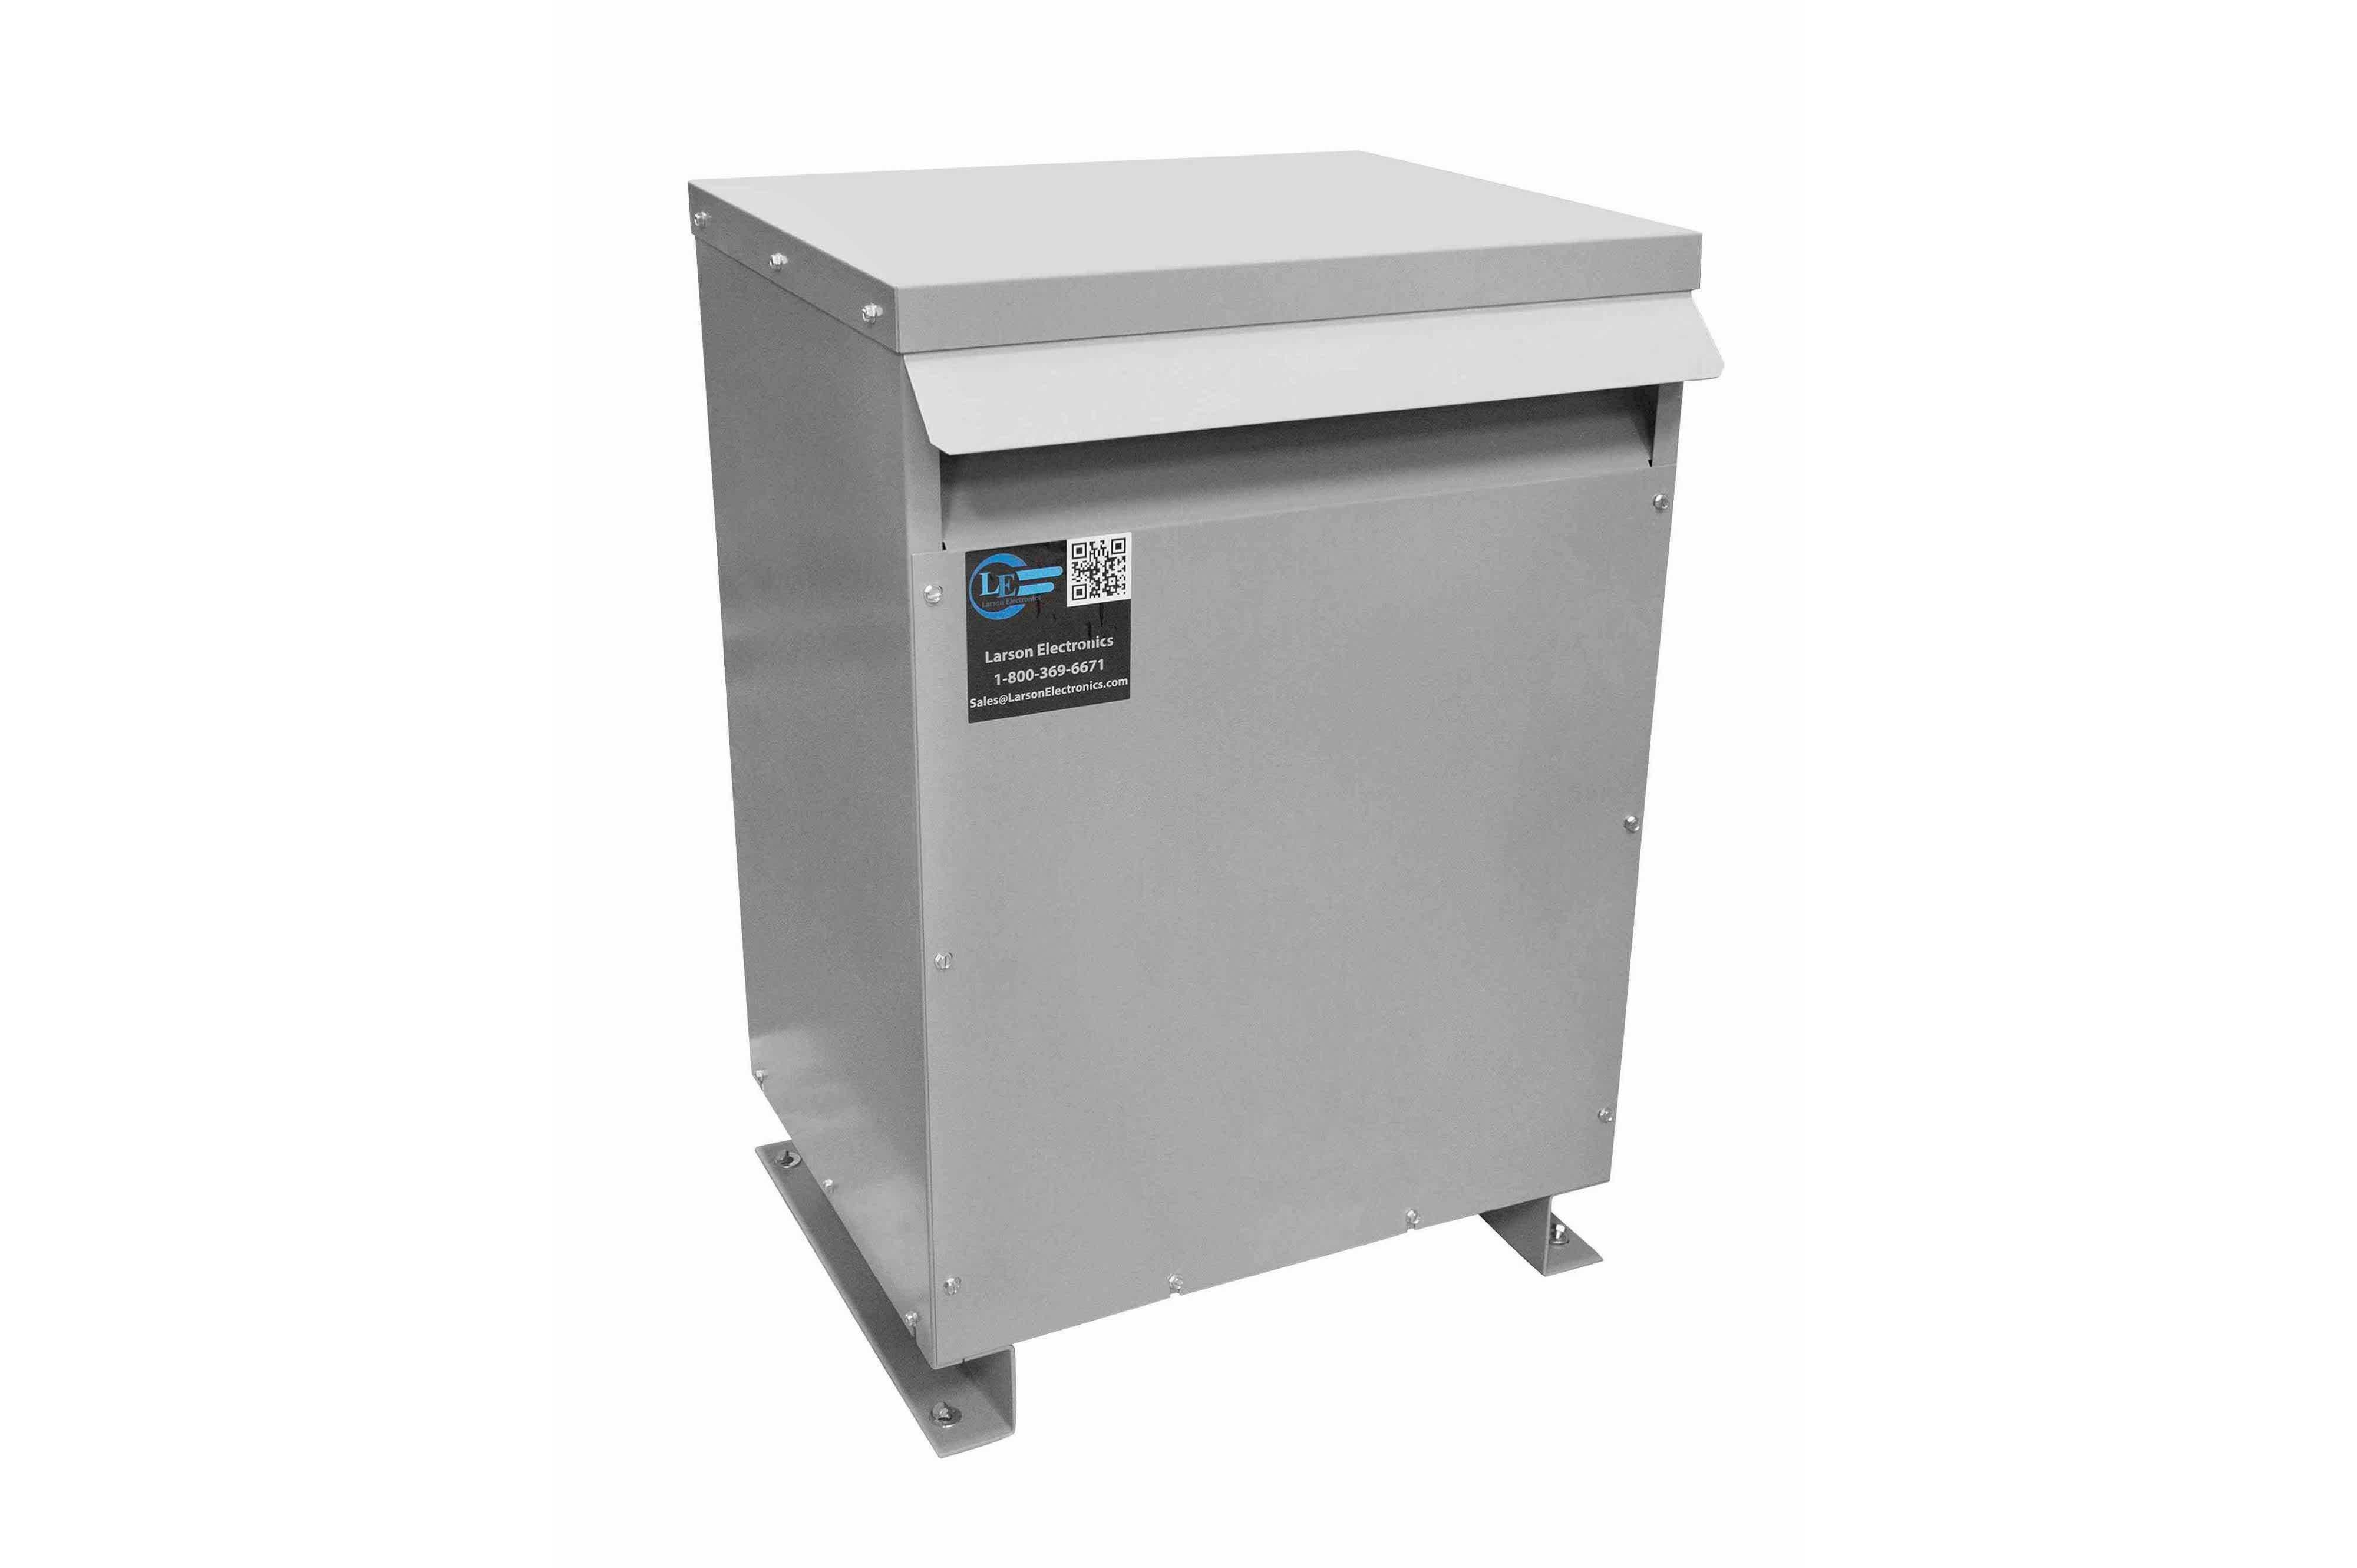 12 kVA 3PH Isolation Transformer, 460V Wye Primary, 400V Delta Secondary, N3R, Ventilated, 60 Hz